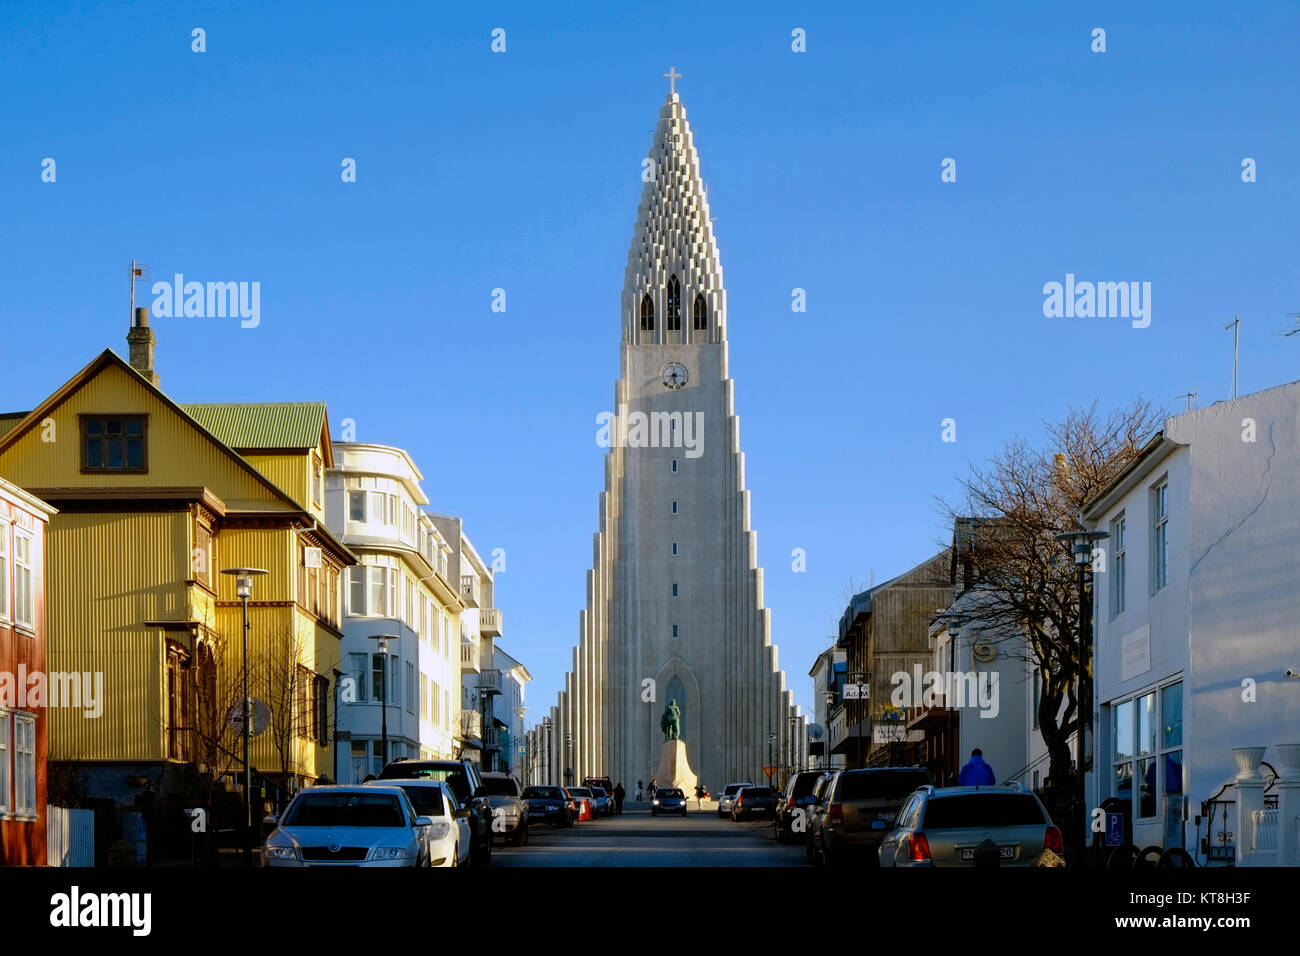 Hallgrimskirkja Church, Reykjavik, Iceland, Polar Region - Stock Image